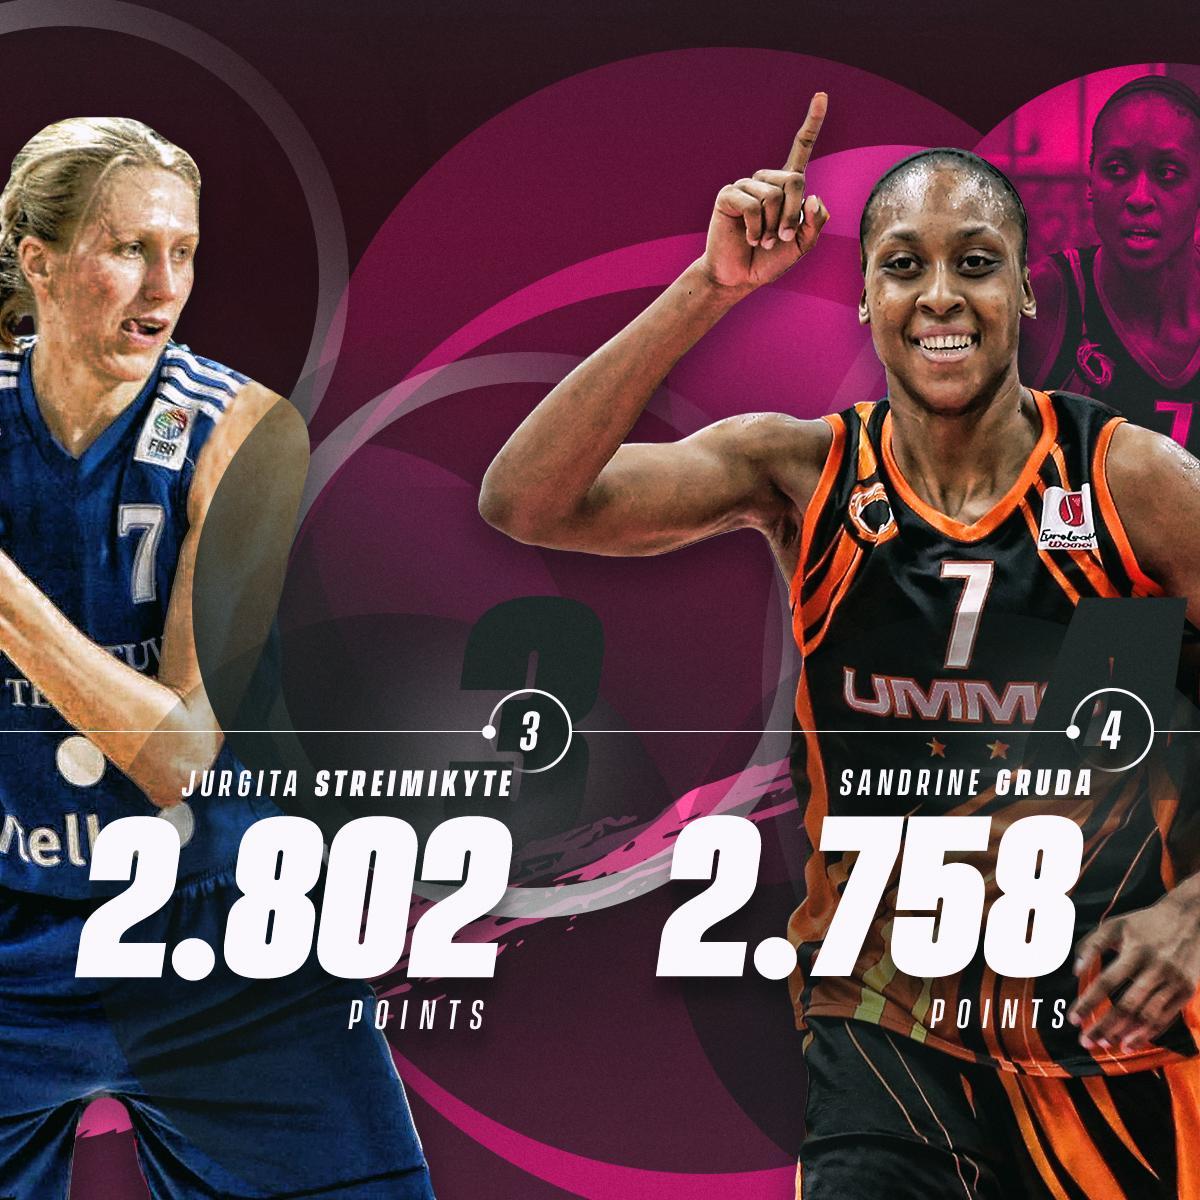 1ebd901ec9a EuroLeague WomenVerified account @EuroLeagueWomen